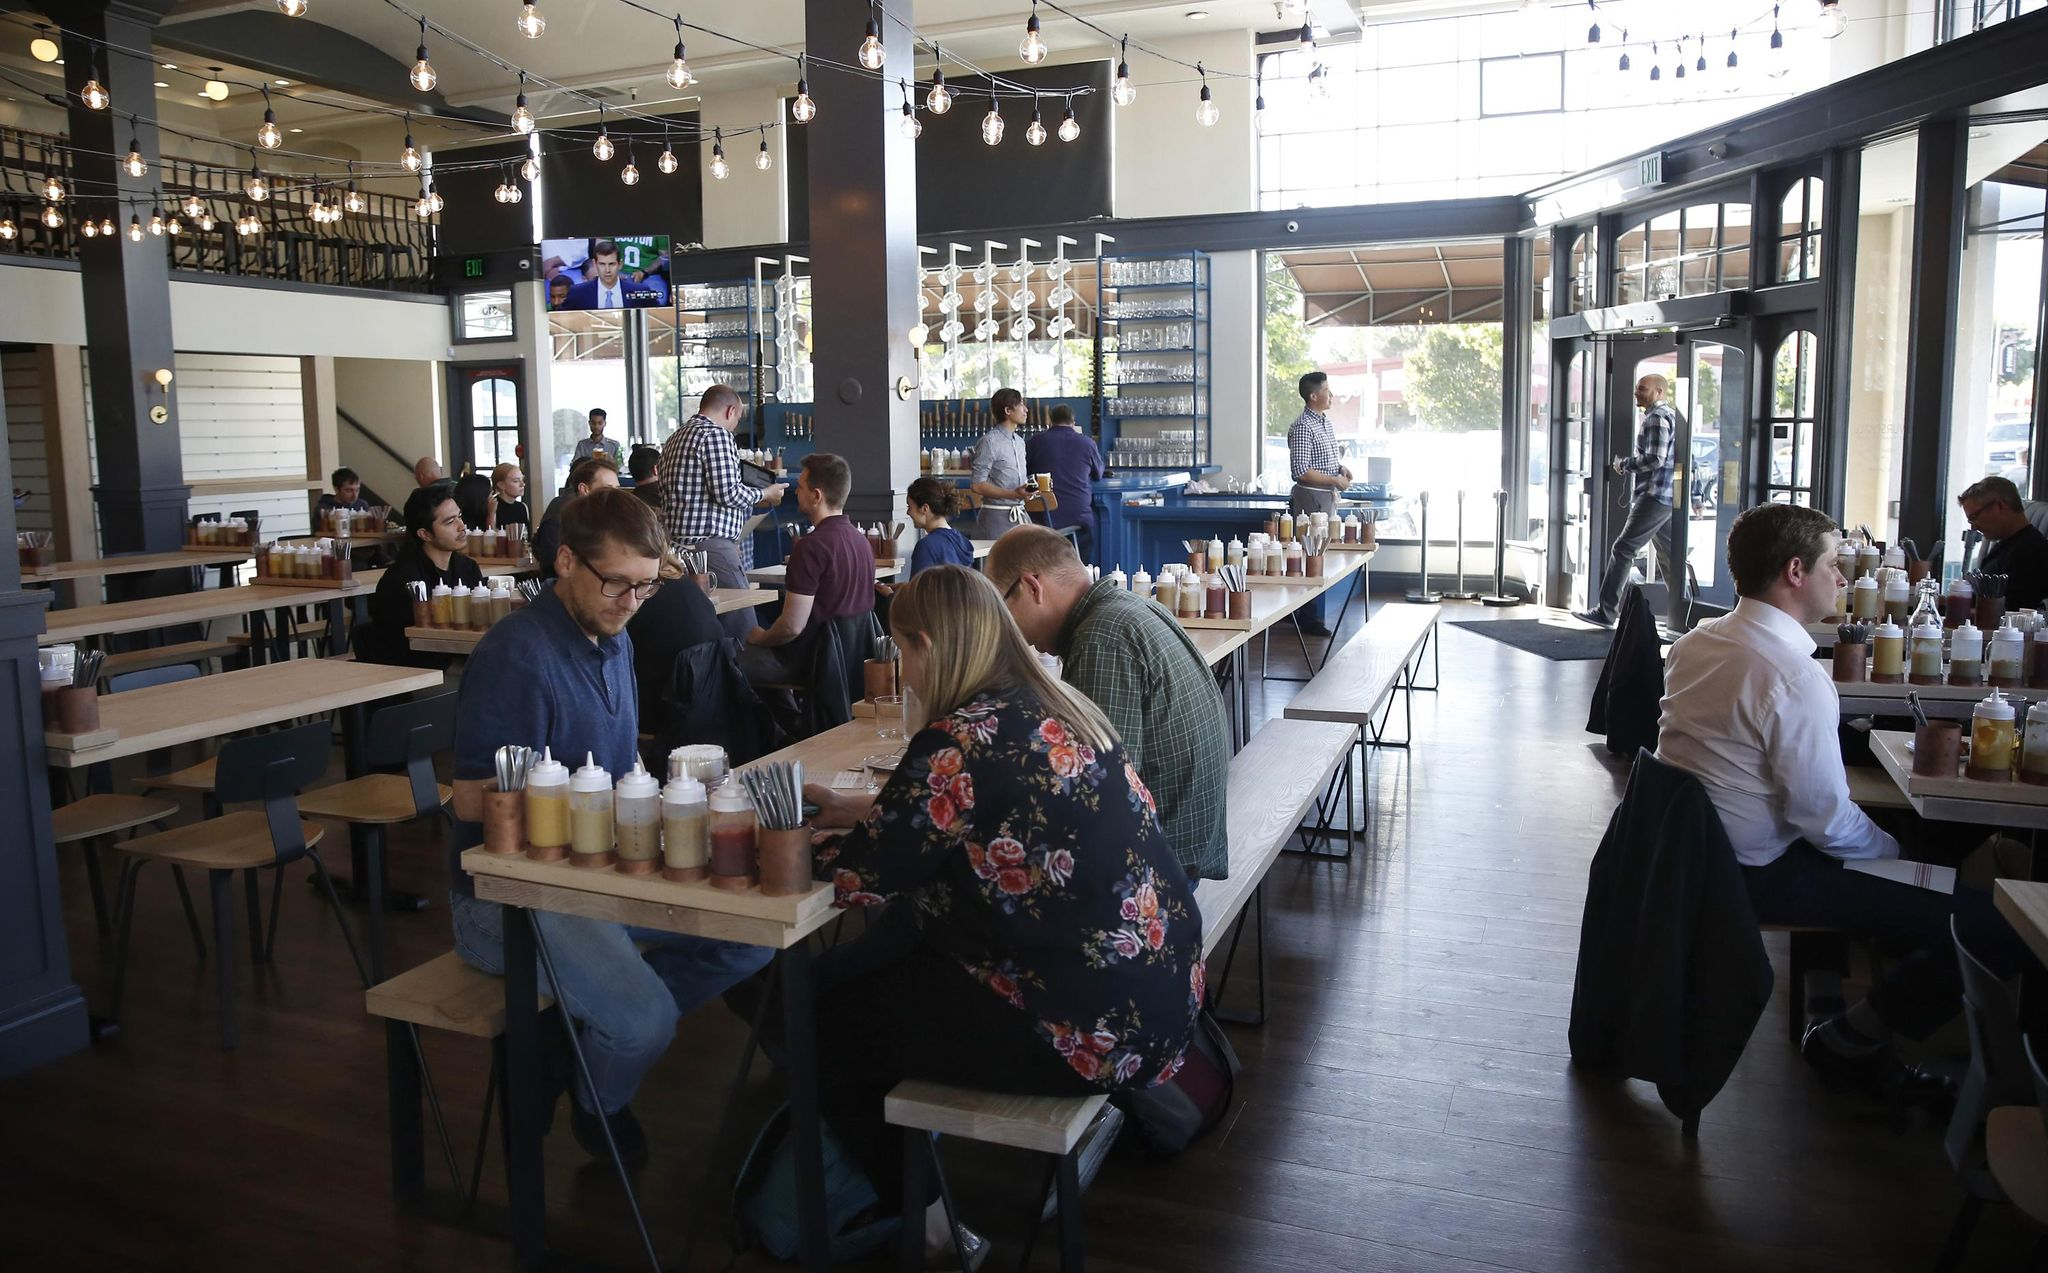 J. Kenji Lopez-Alt, Wursthall restaurant chef-partner, bans MAGA hats thumbnail